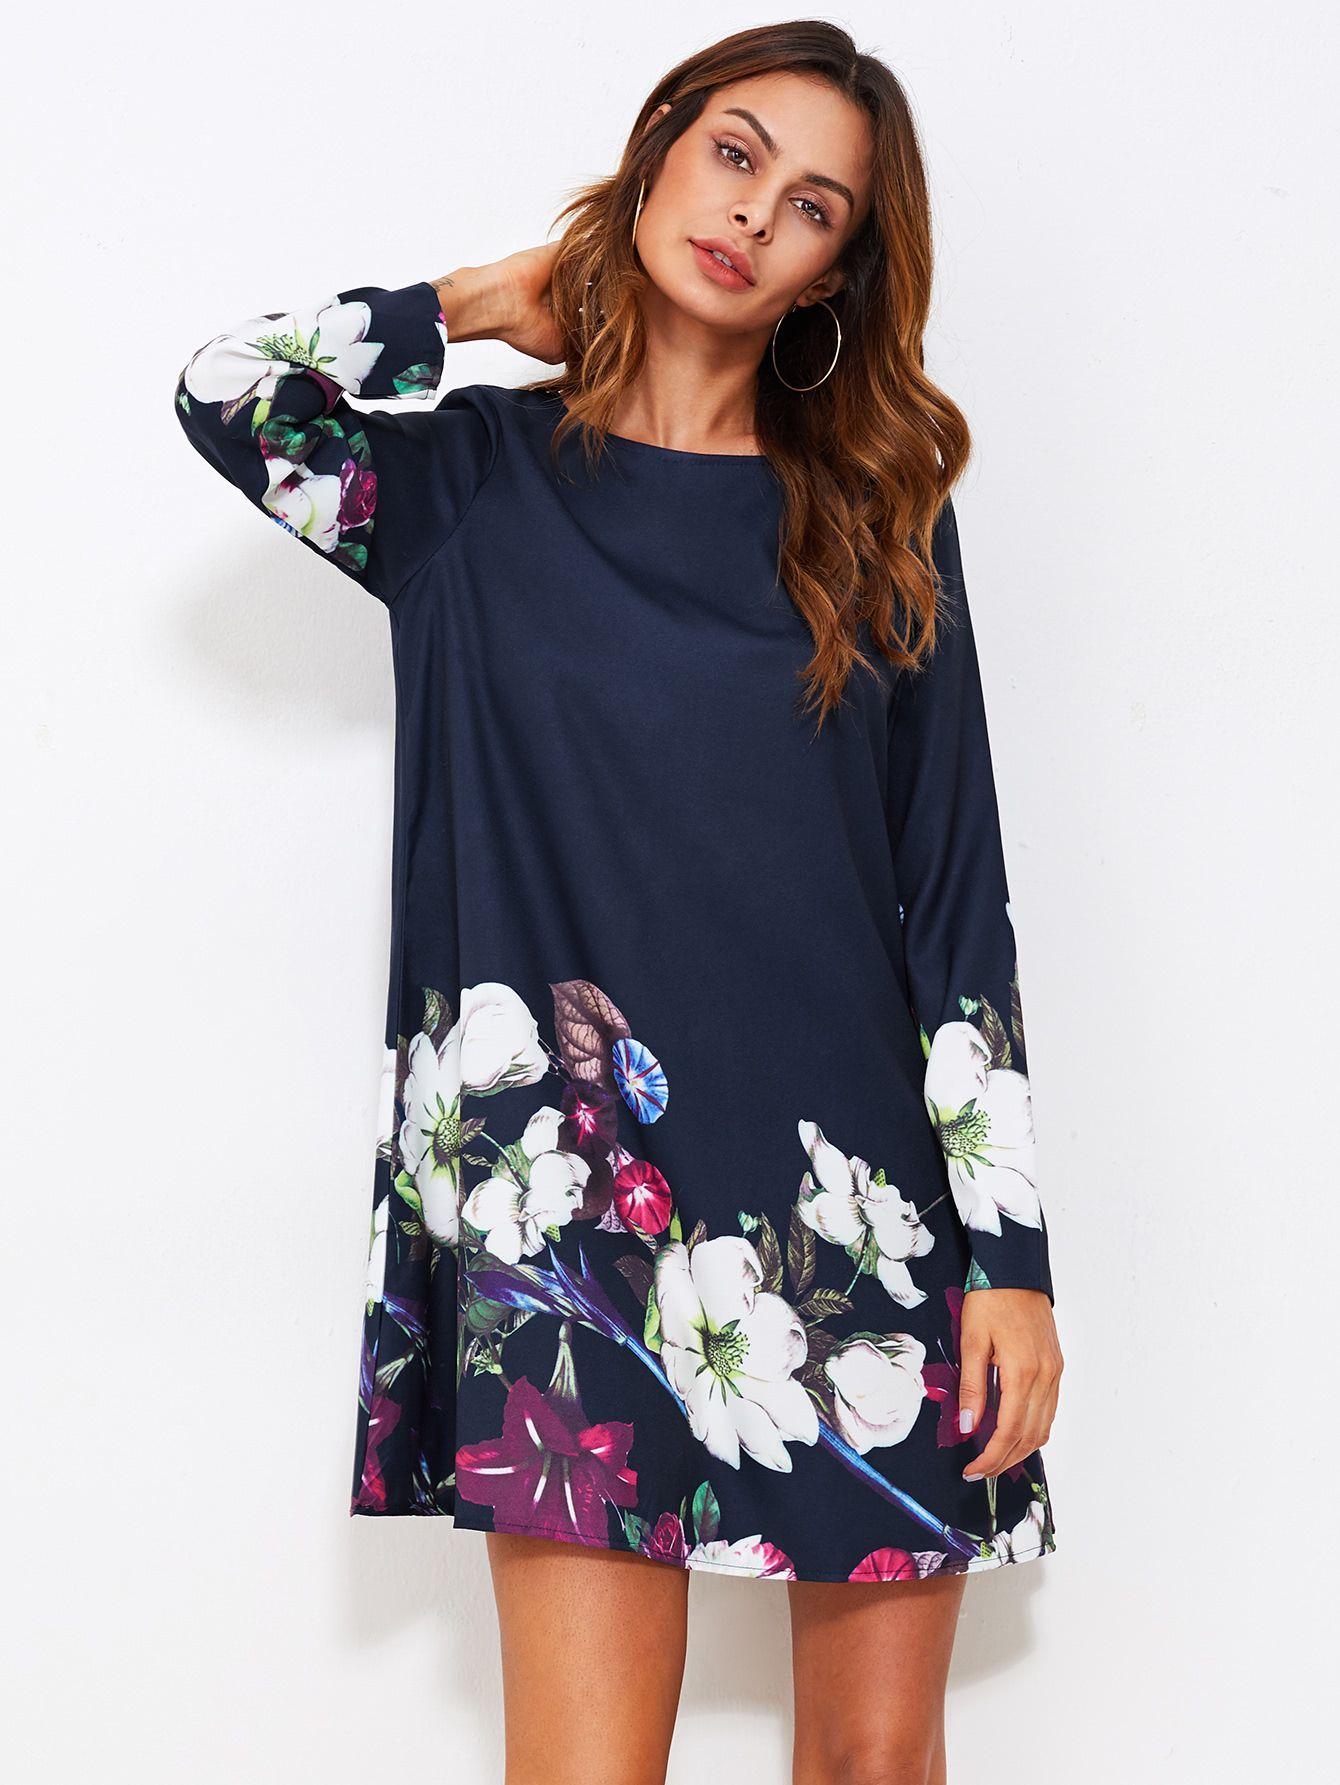 c9788fae771d3 Shop Flower Print Flowy Dress online. SheIn offers Flower Print Flowy Dress  & more